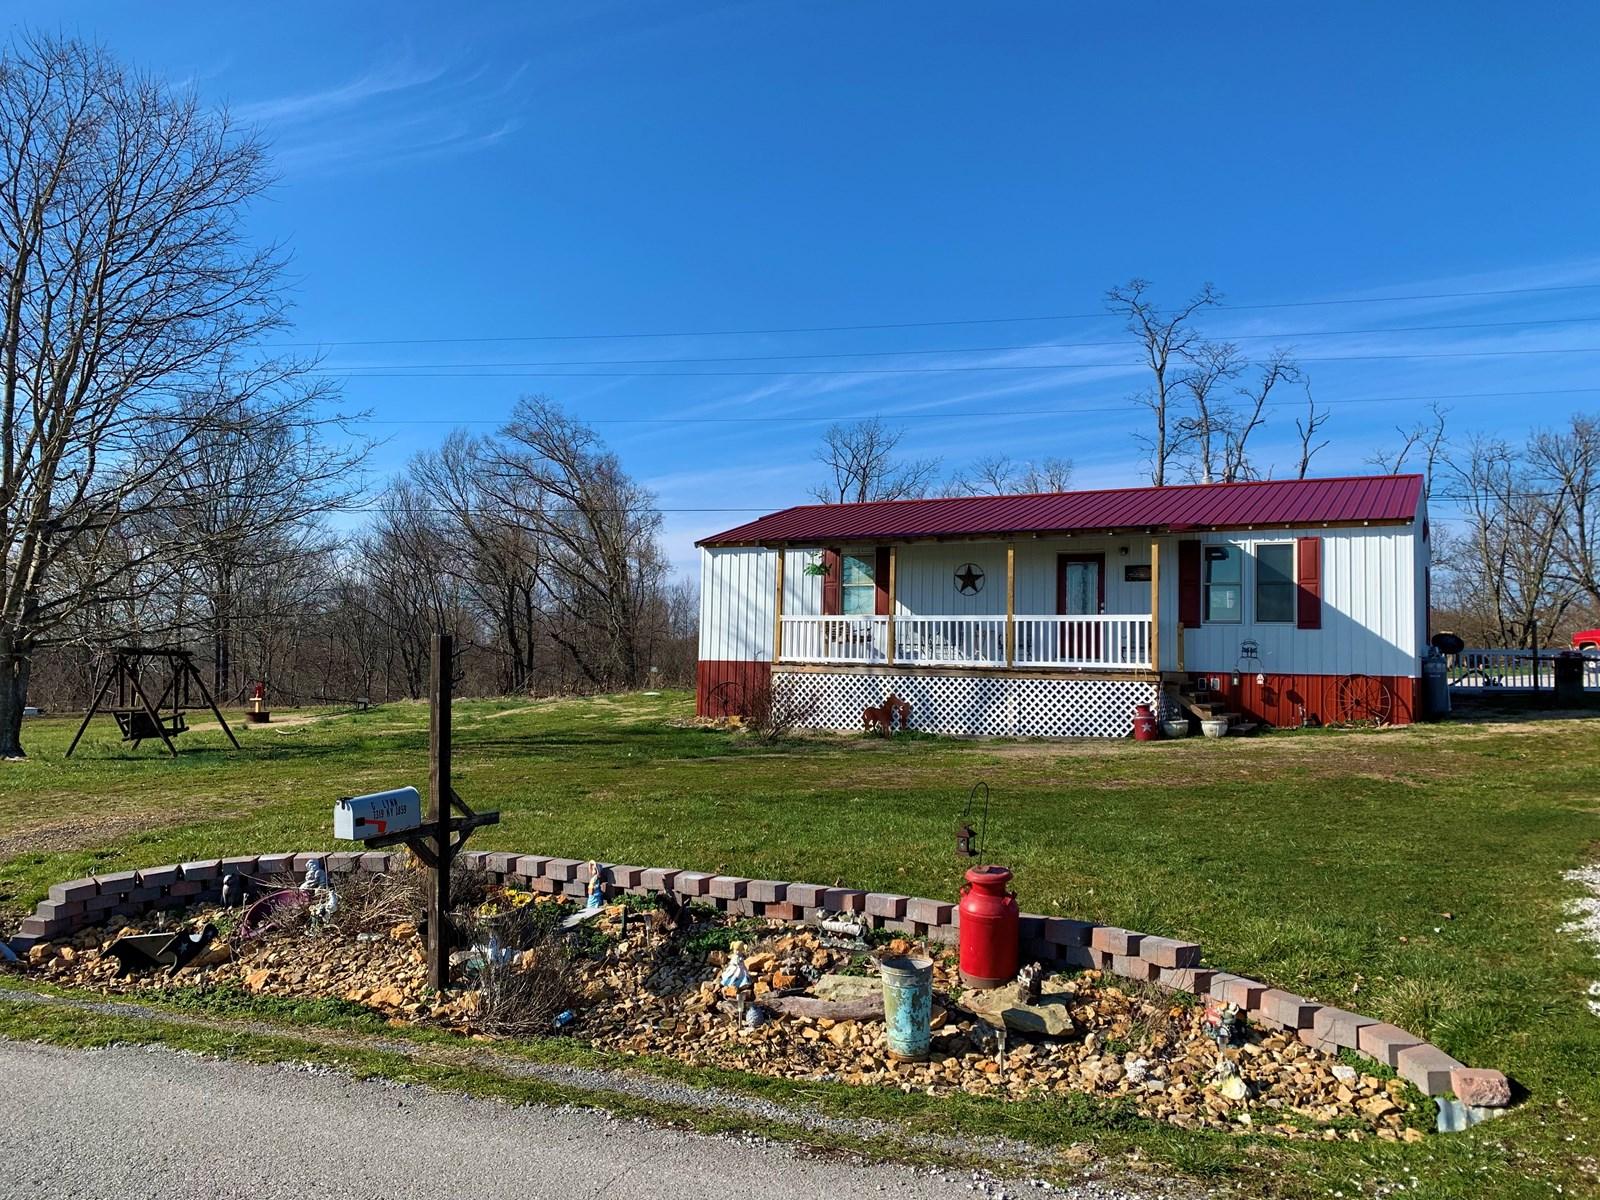 COUNTRY HOME-CARPORT-STORAGE BUILDING/LIBERTY KENTUCKY